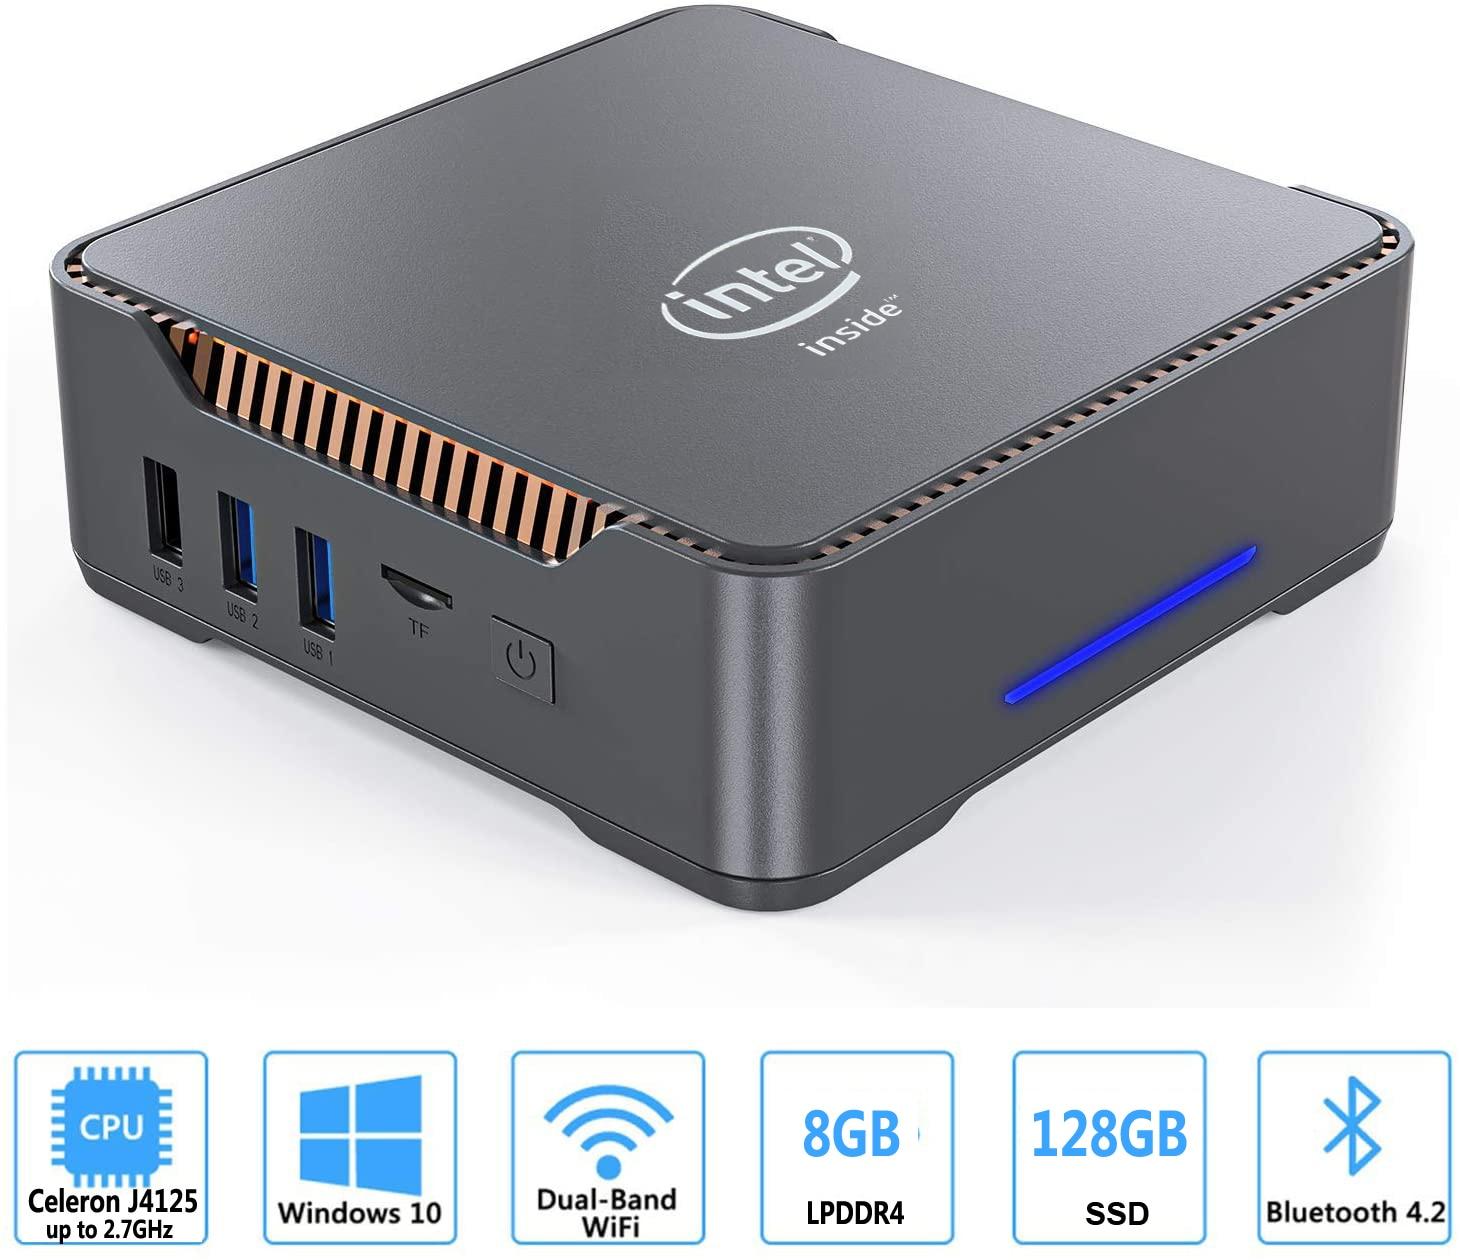 GK3V мини ПК Intel celeron J4125 Quad core 8 Гб Оперативная память 128 Гб/256 ГБ Windows 10 двойной WI FI, 4K 60Hz WIN10 двойной HDMI VGA настольных ПК HTPC|Мини ПК|   | АлиЭкспресс